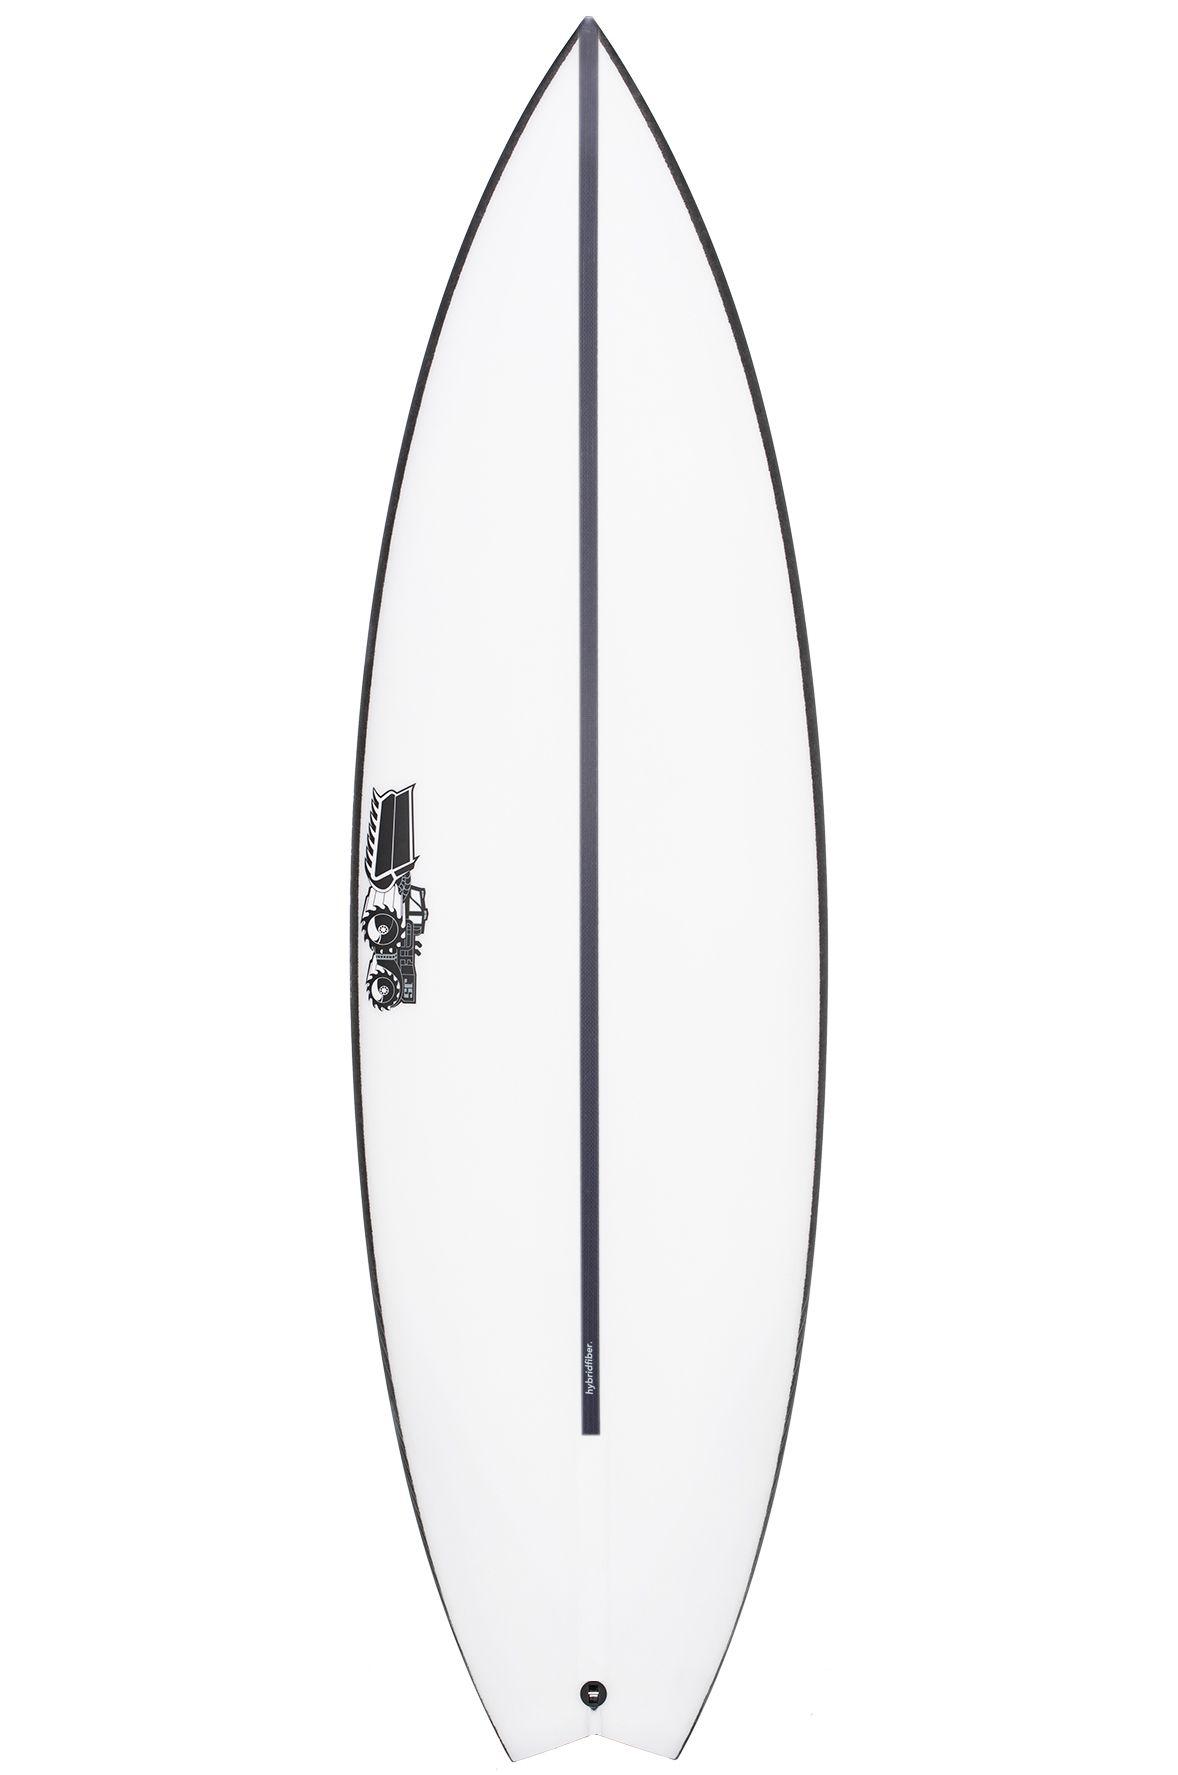 Prancha Surf JS 5'7 MONSTA BOX HYFI Swallow Tail - Color FCS II 5ft7